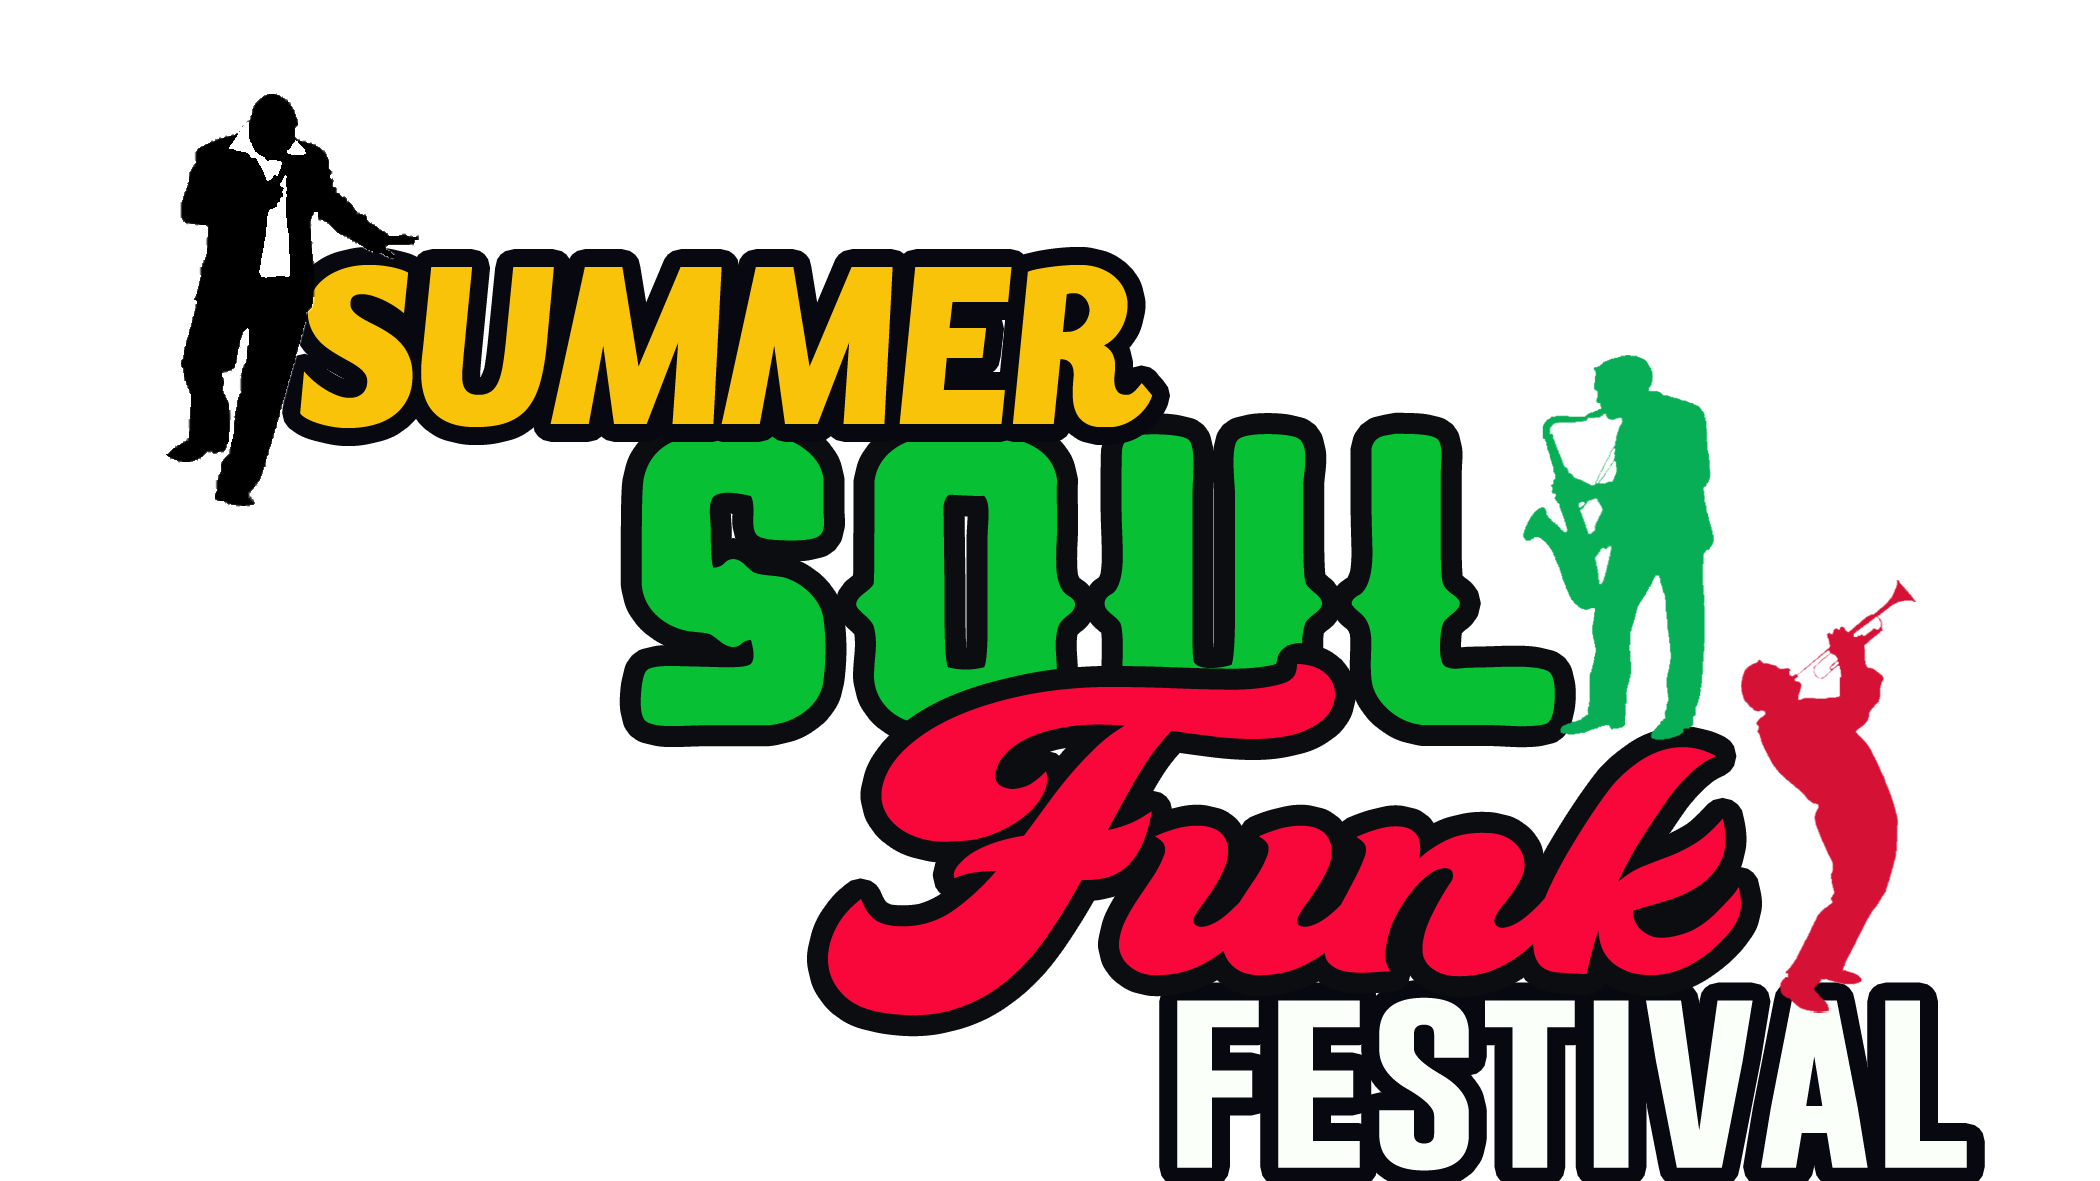 Summer soul funk festival. Fundraiser clipart vendor fair